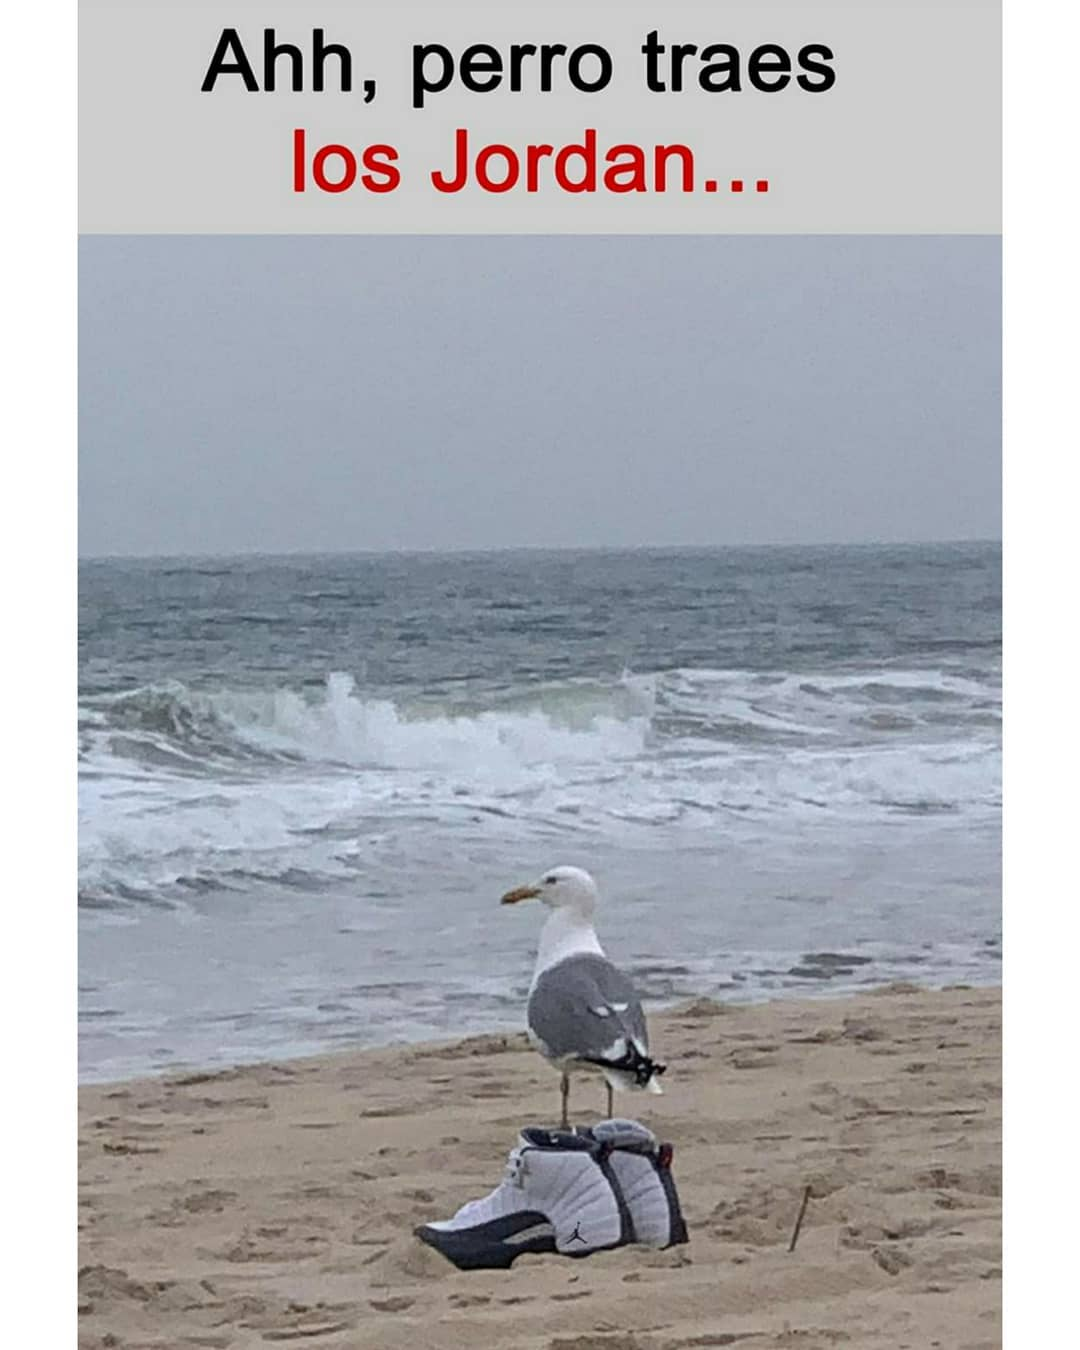 Ahh, perro traes los Jordan...